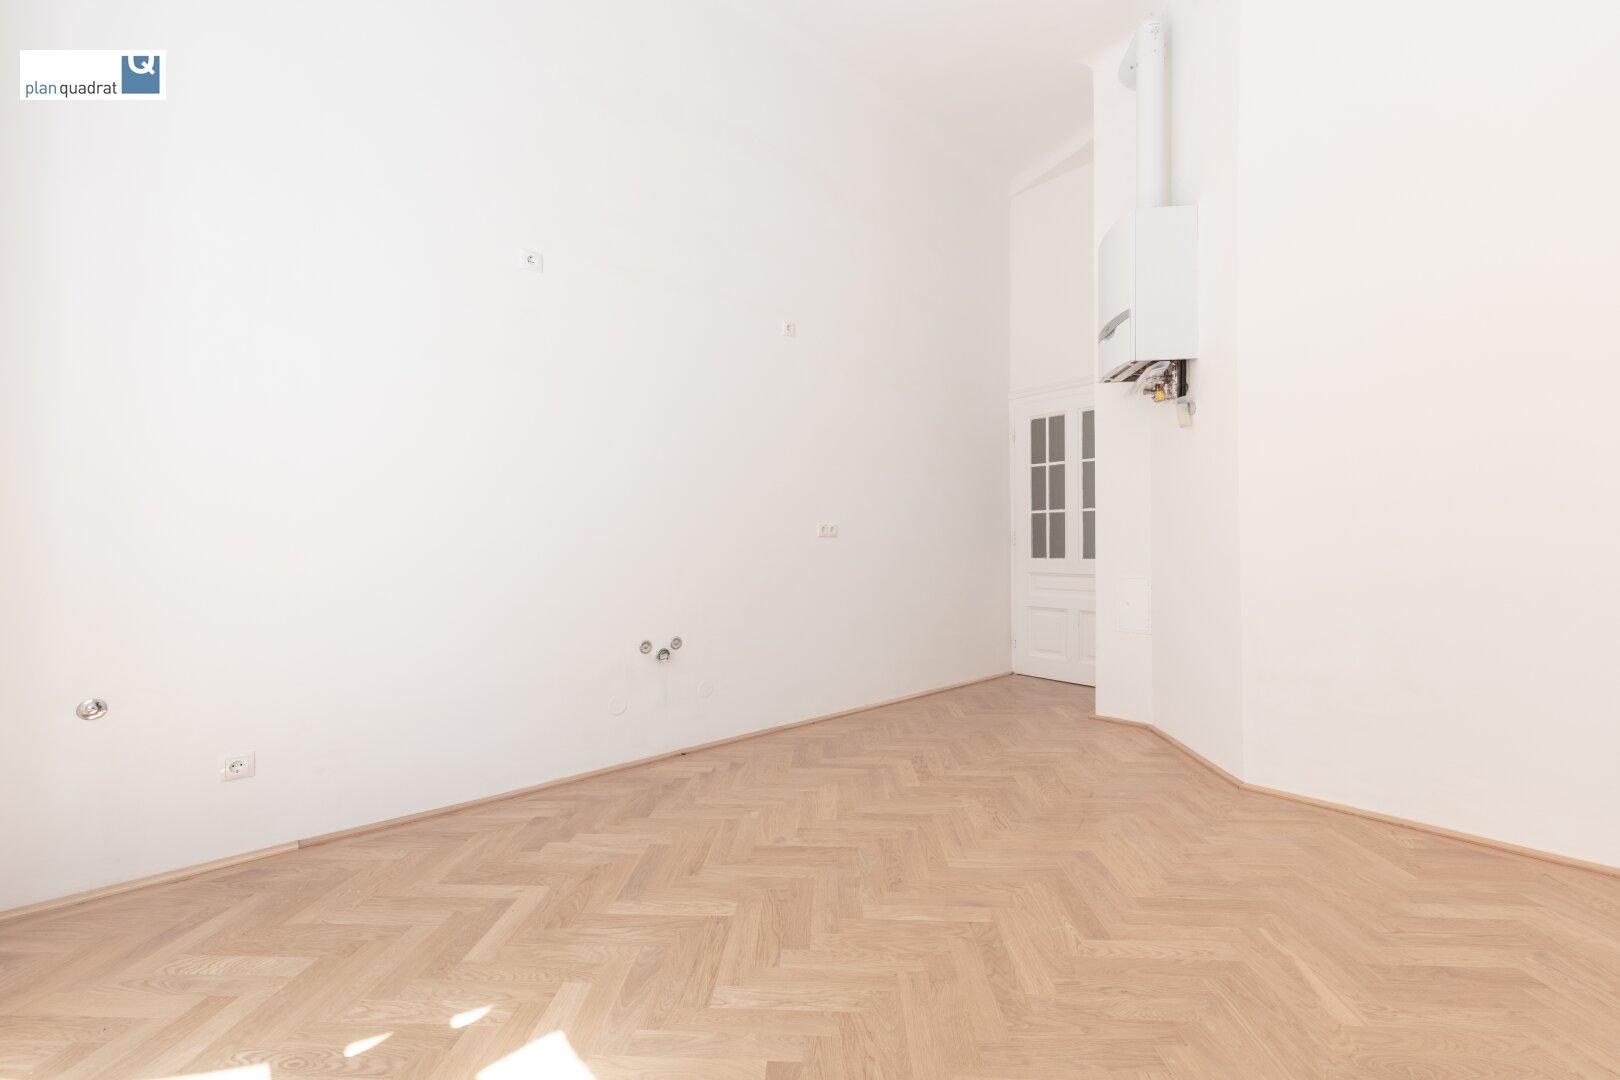 Raum 7 (gem. Grunsrissskizze - ca. 14,80 qm)